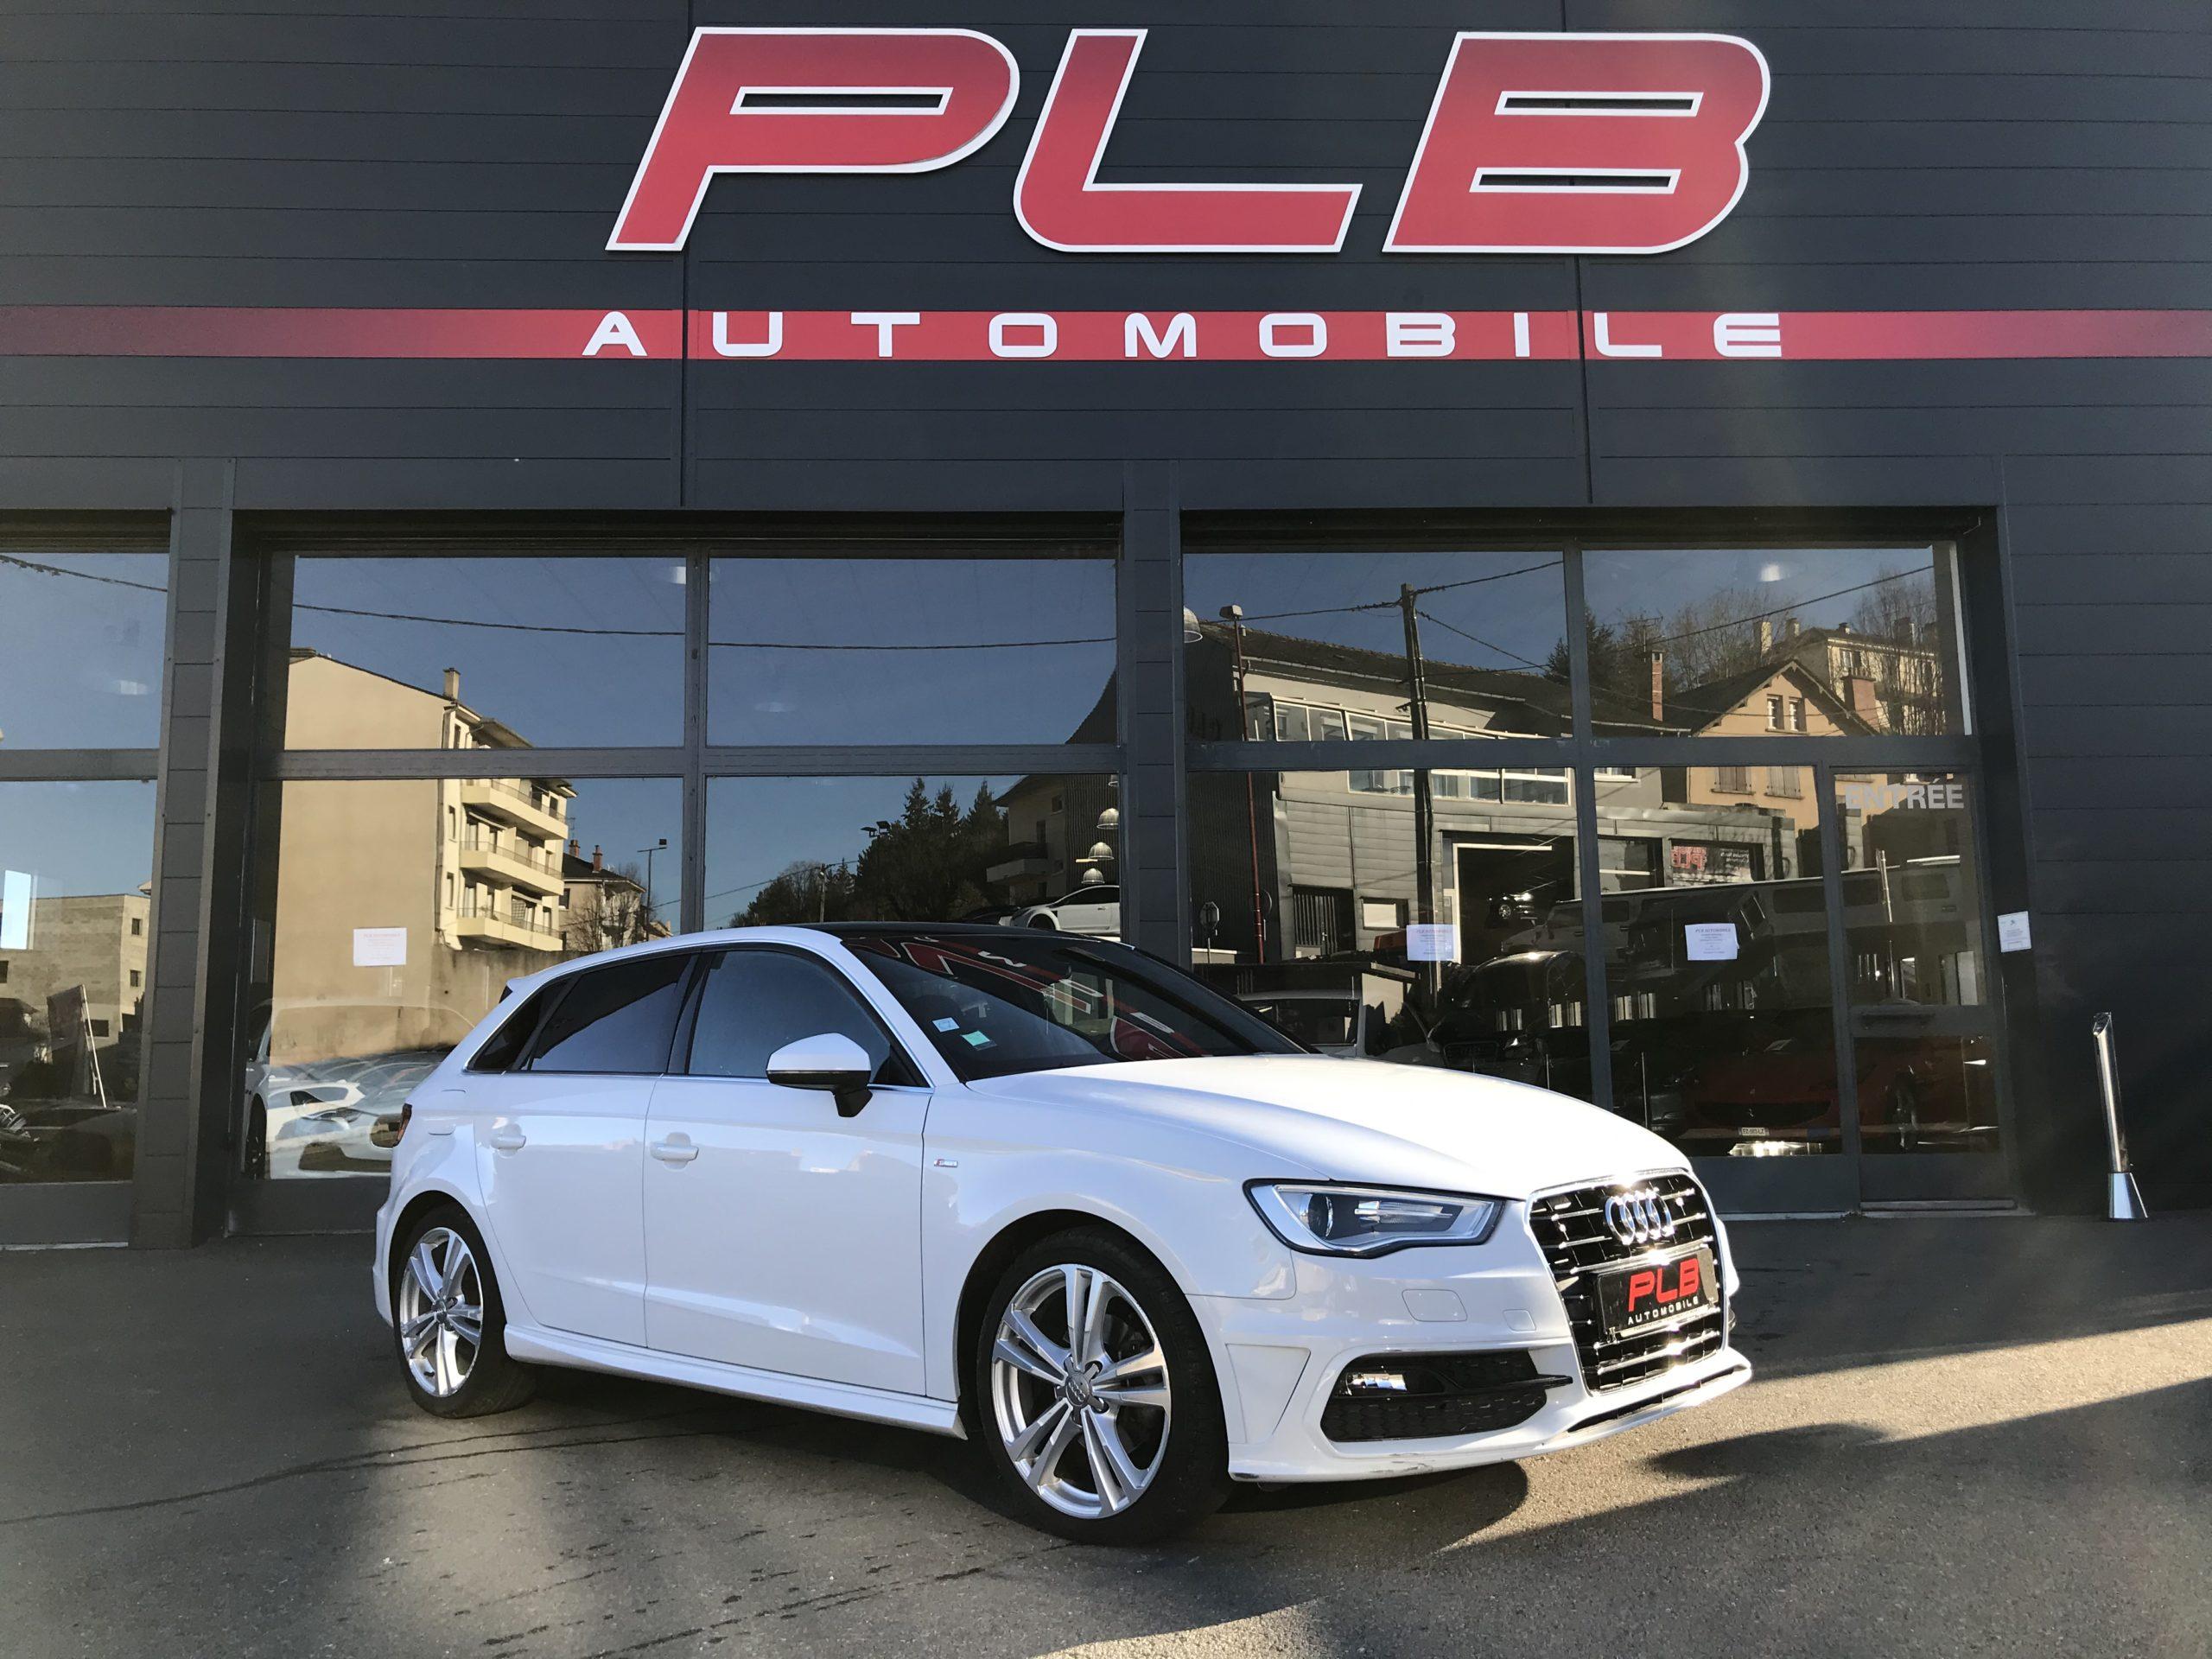 Audi A3 Sportback 2.0 TDI 150CV S-Line BVA GPS/Bluetooth